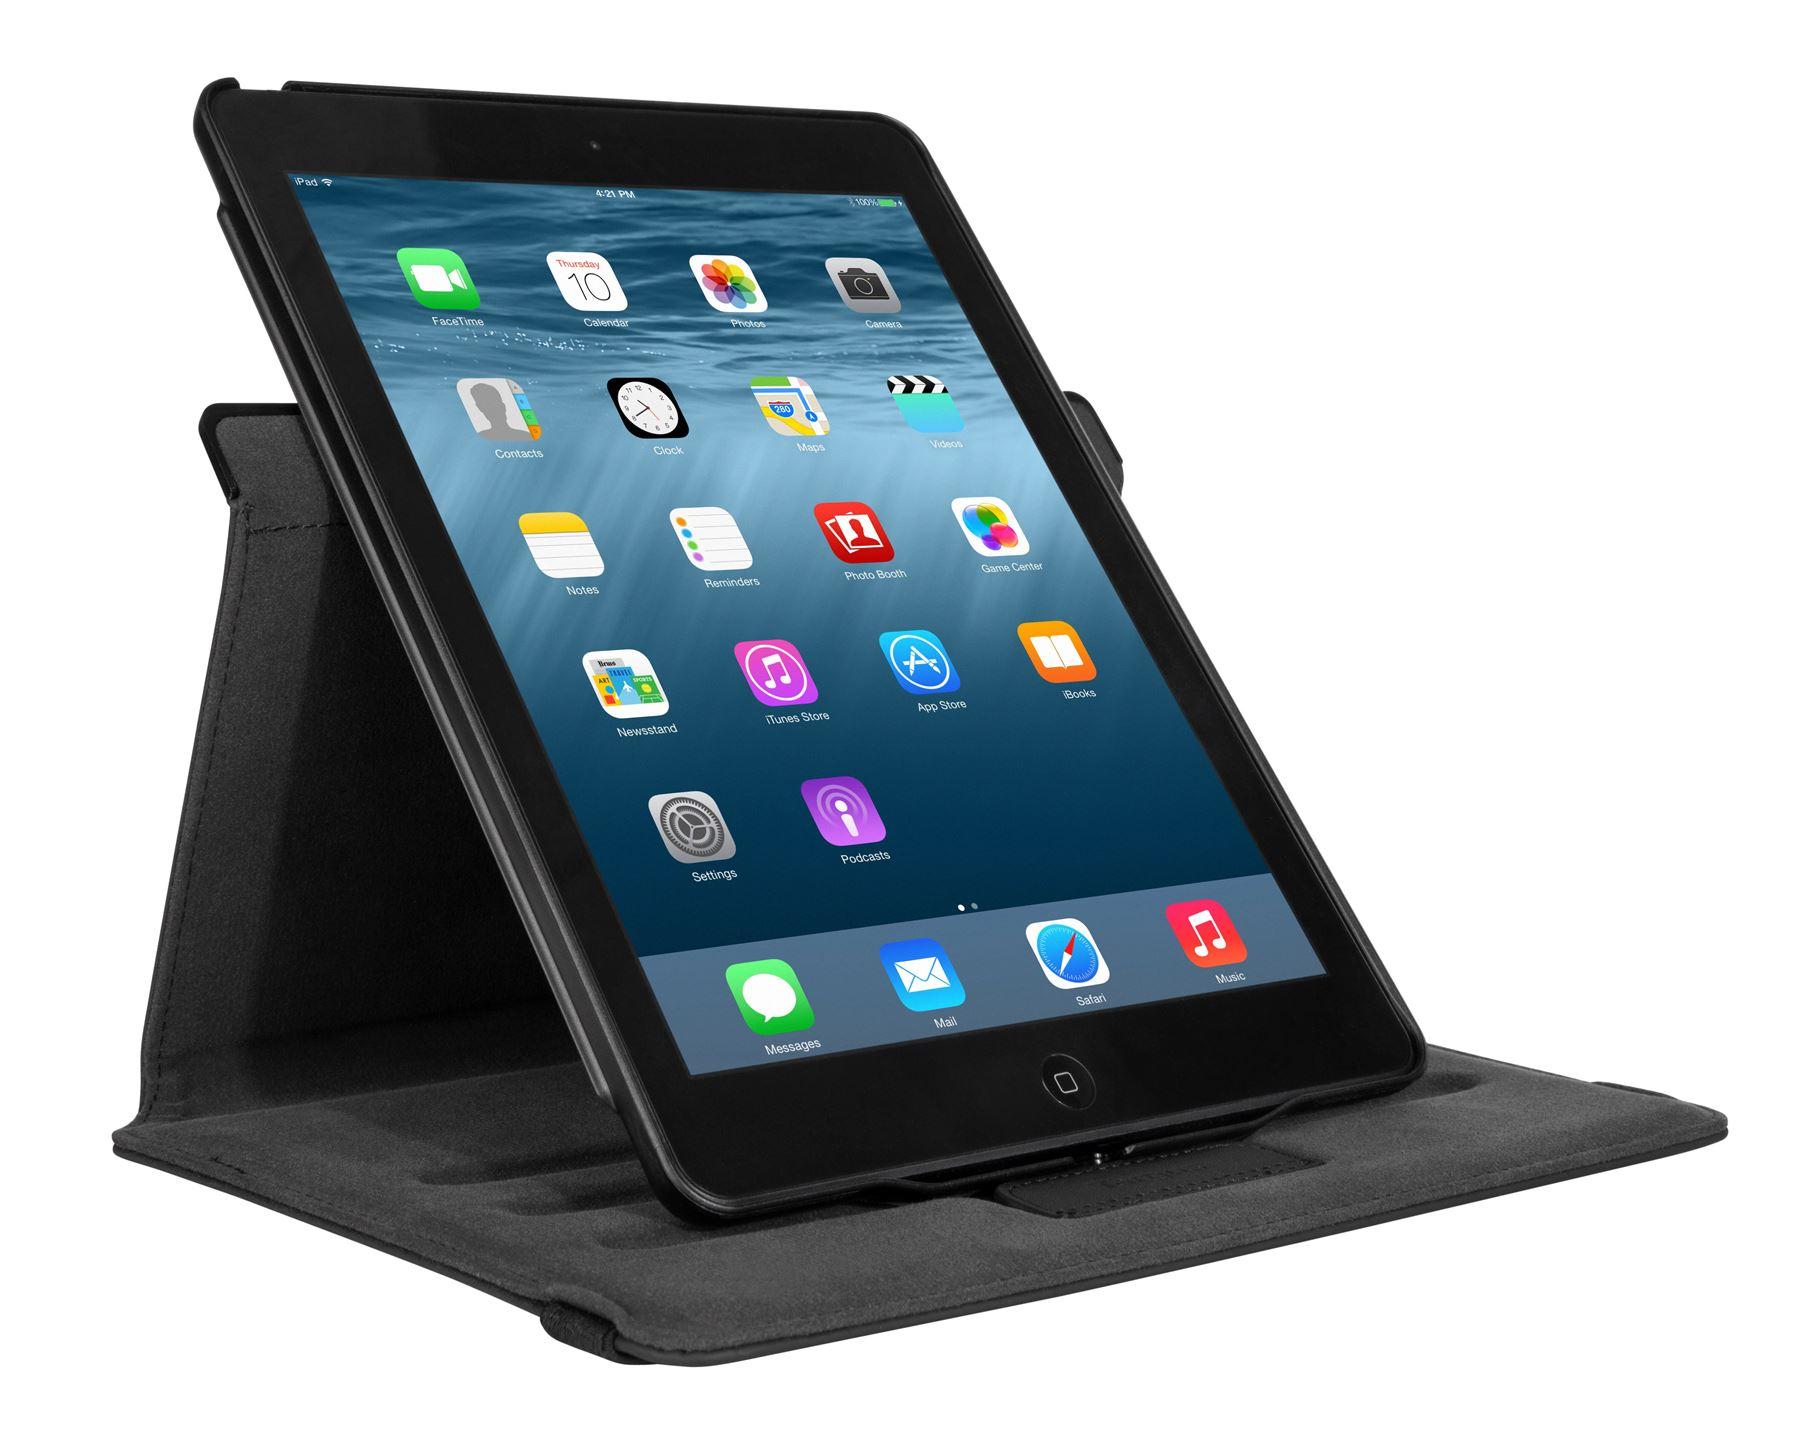 versavu 360 slim case for ipad air 2 thz471us black. Black Bedroom Furniture Sets. Home Design Ideas